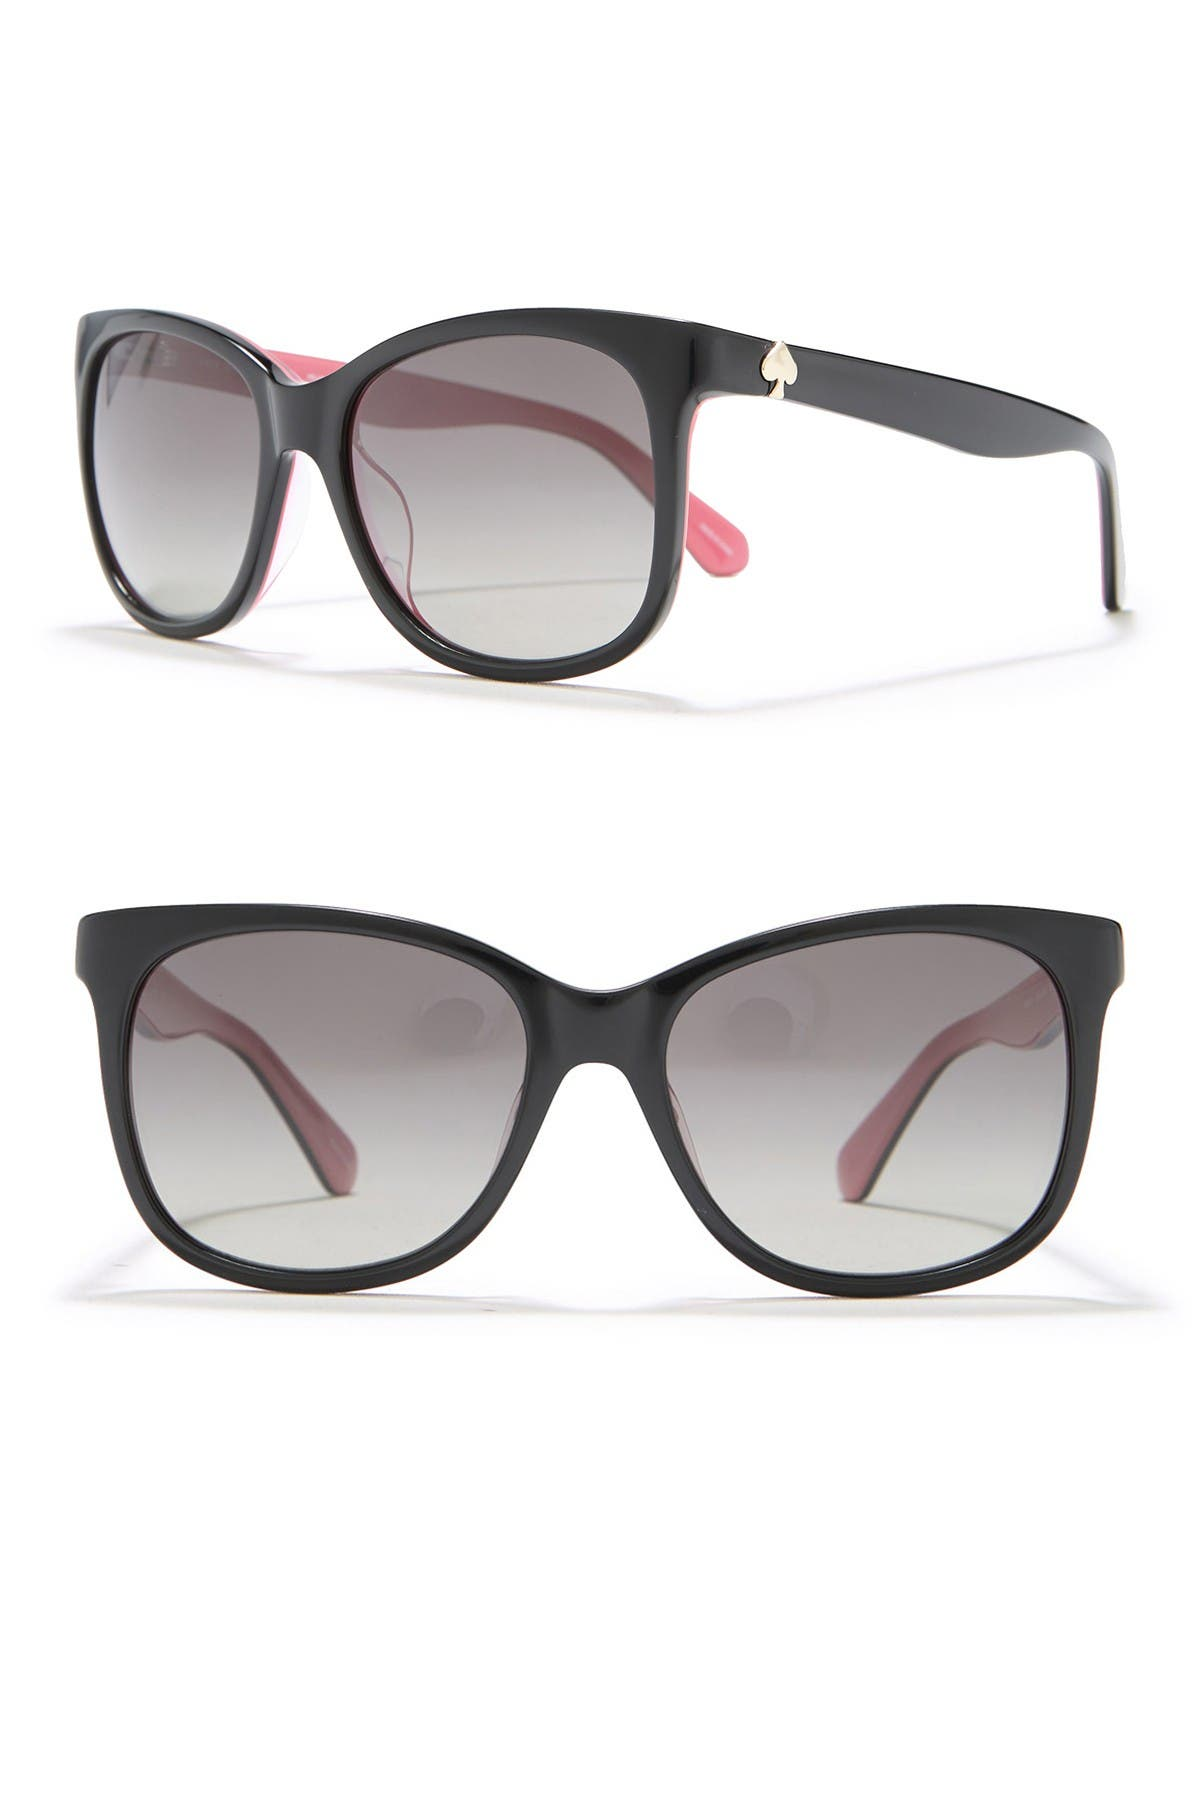 Image of kate spade new york danalyn 54mm oversized sunglasses